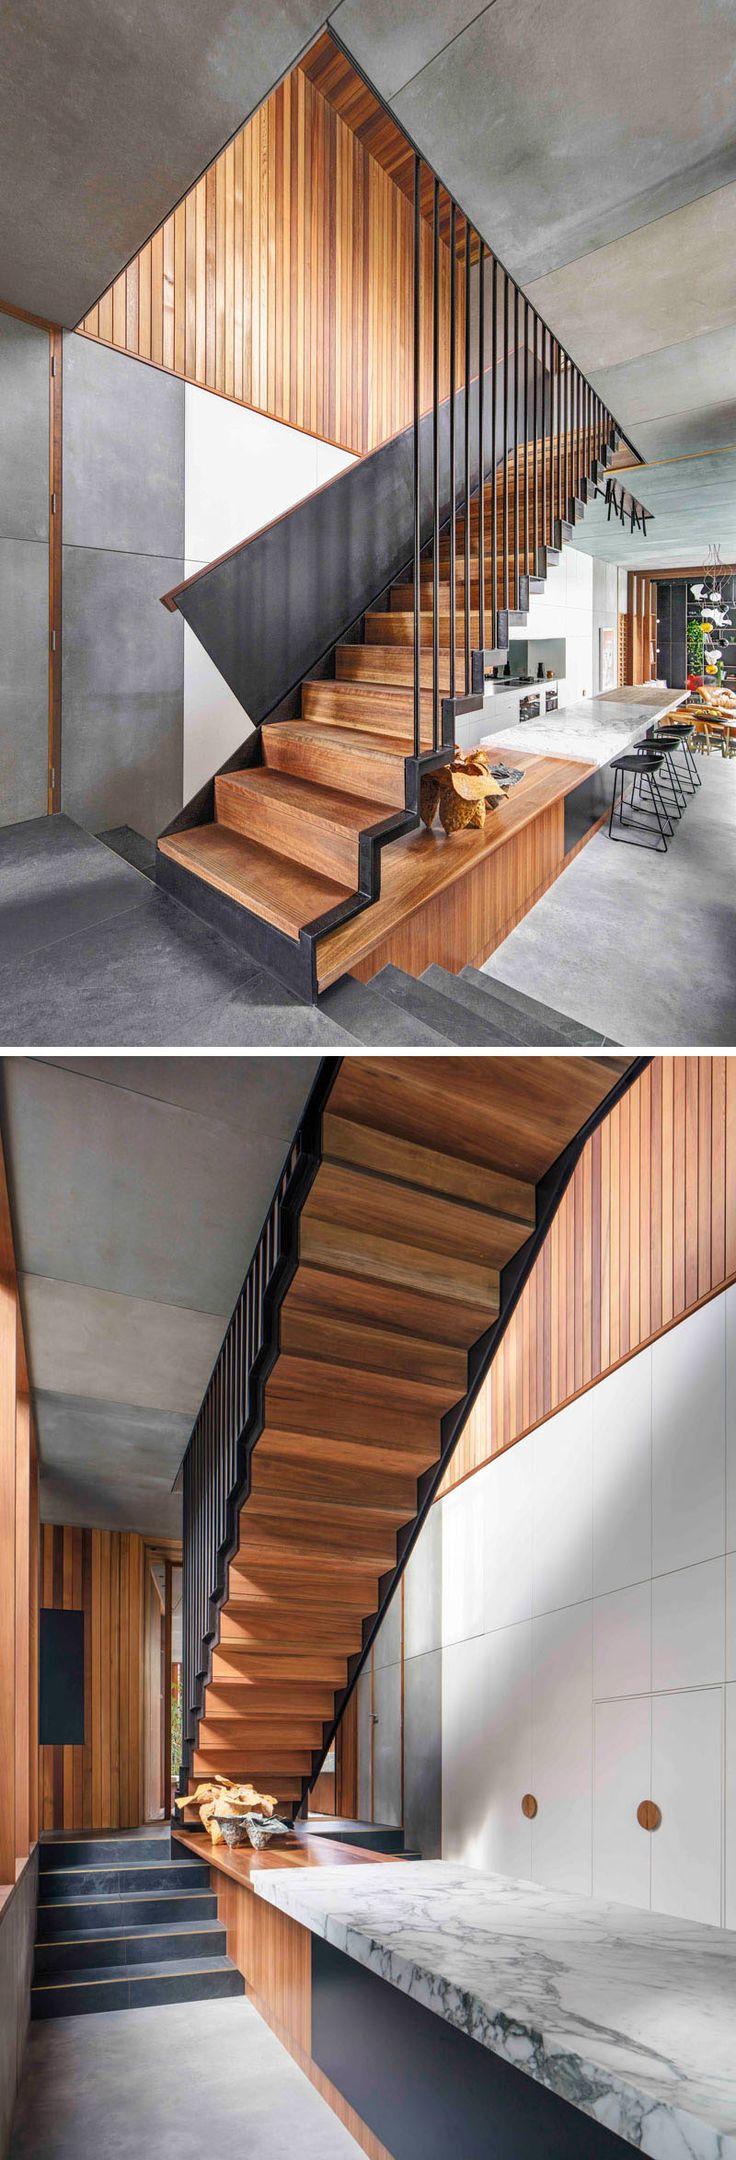 Best 25+ House interiors ideas on Pinterest